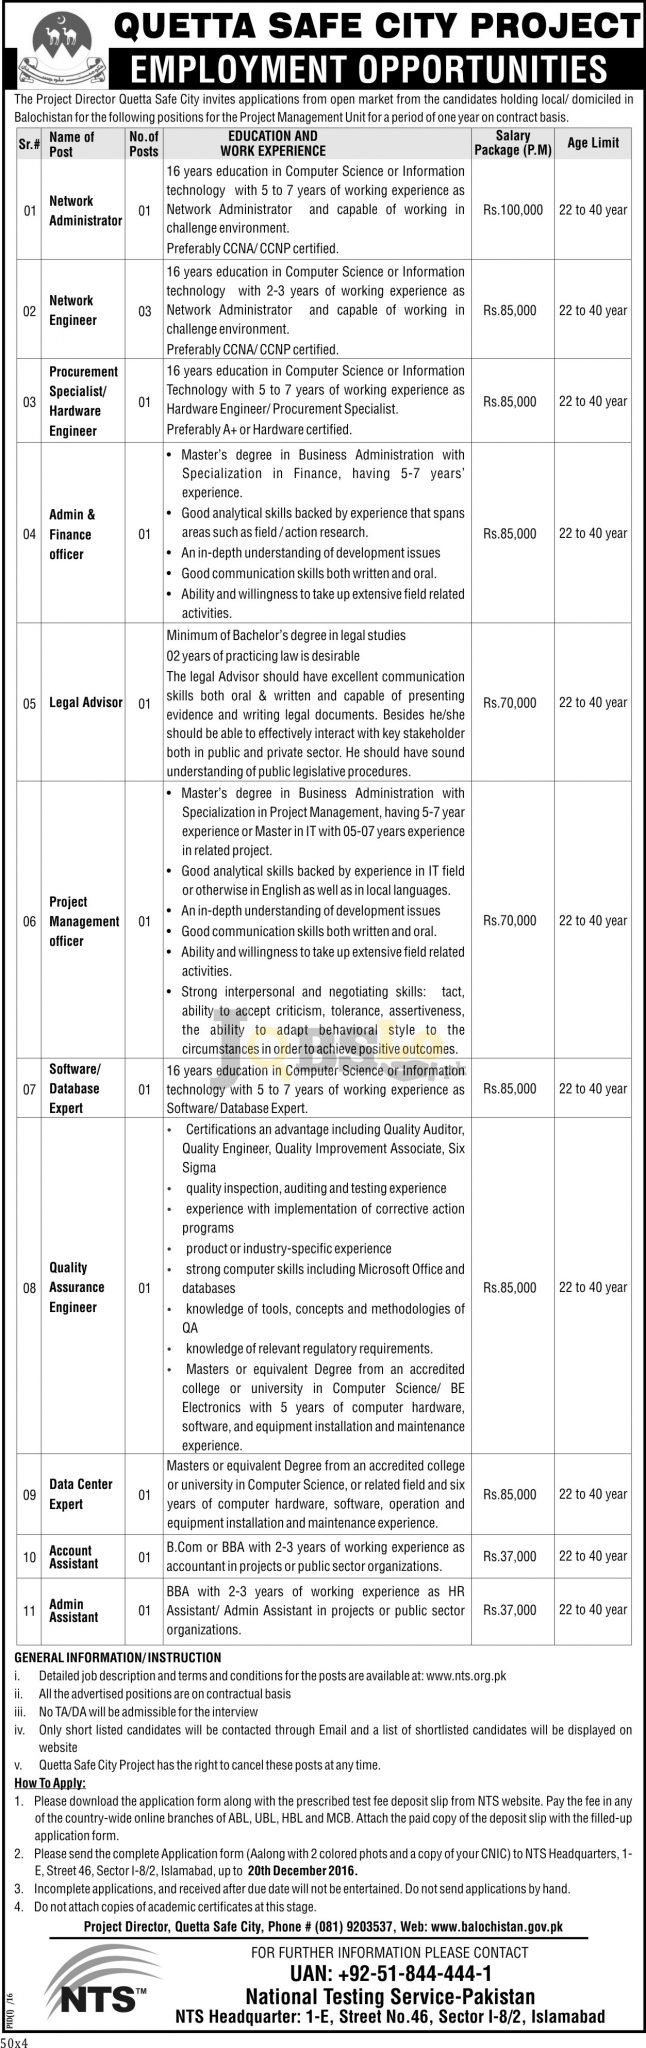 Quetta Safe City Jobs 2016 NTS Online Application Form nts.org.pk